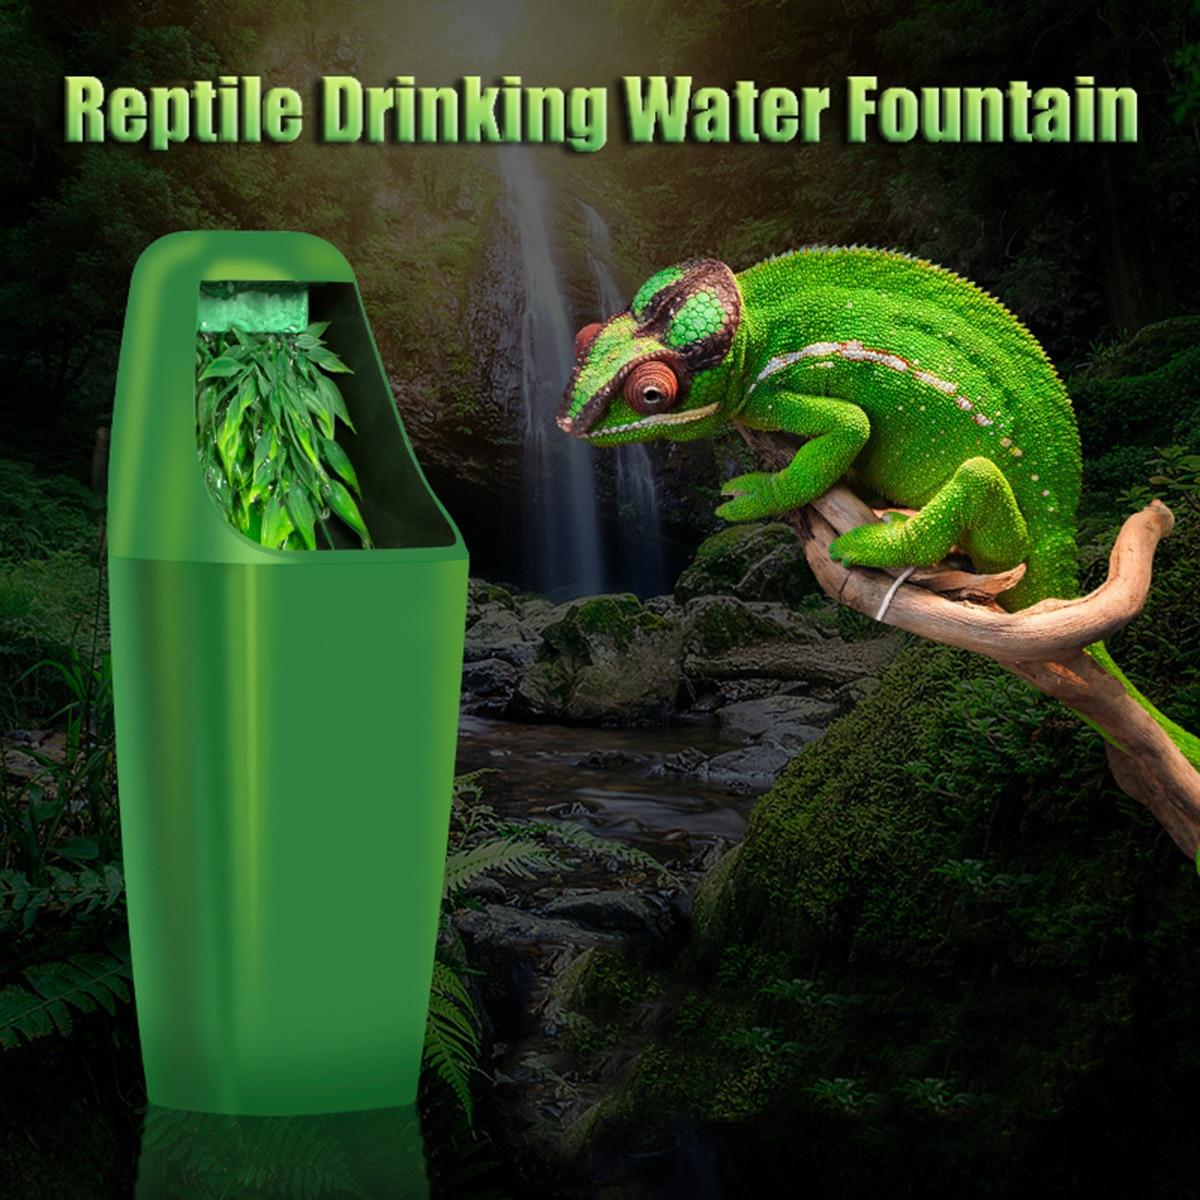 Reptile Drinking Water Filter Fountain Feeding Chameleon Lizard Dispenser Terrarium Reptiles Feeding Supplies 220-240V AC поилка для хамелеона